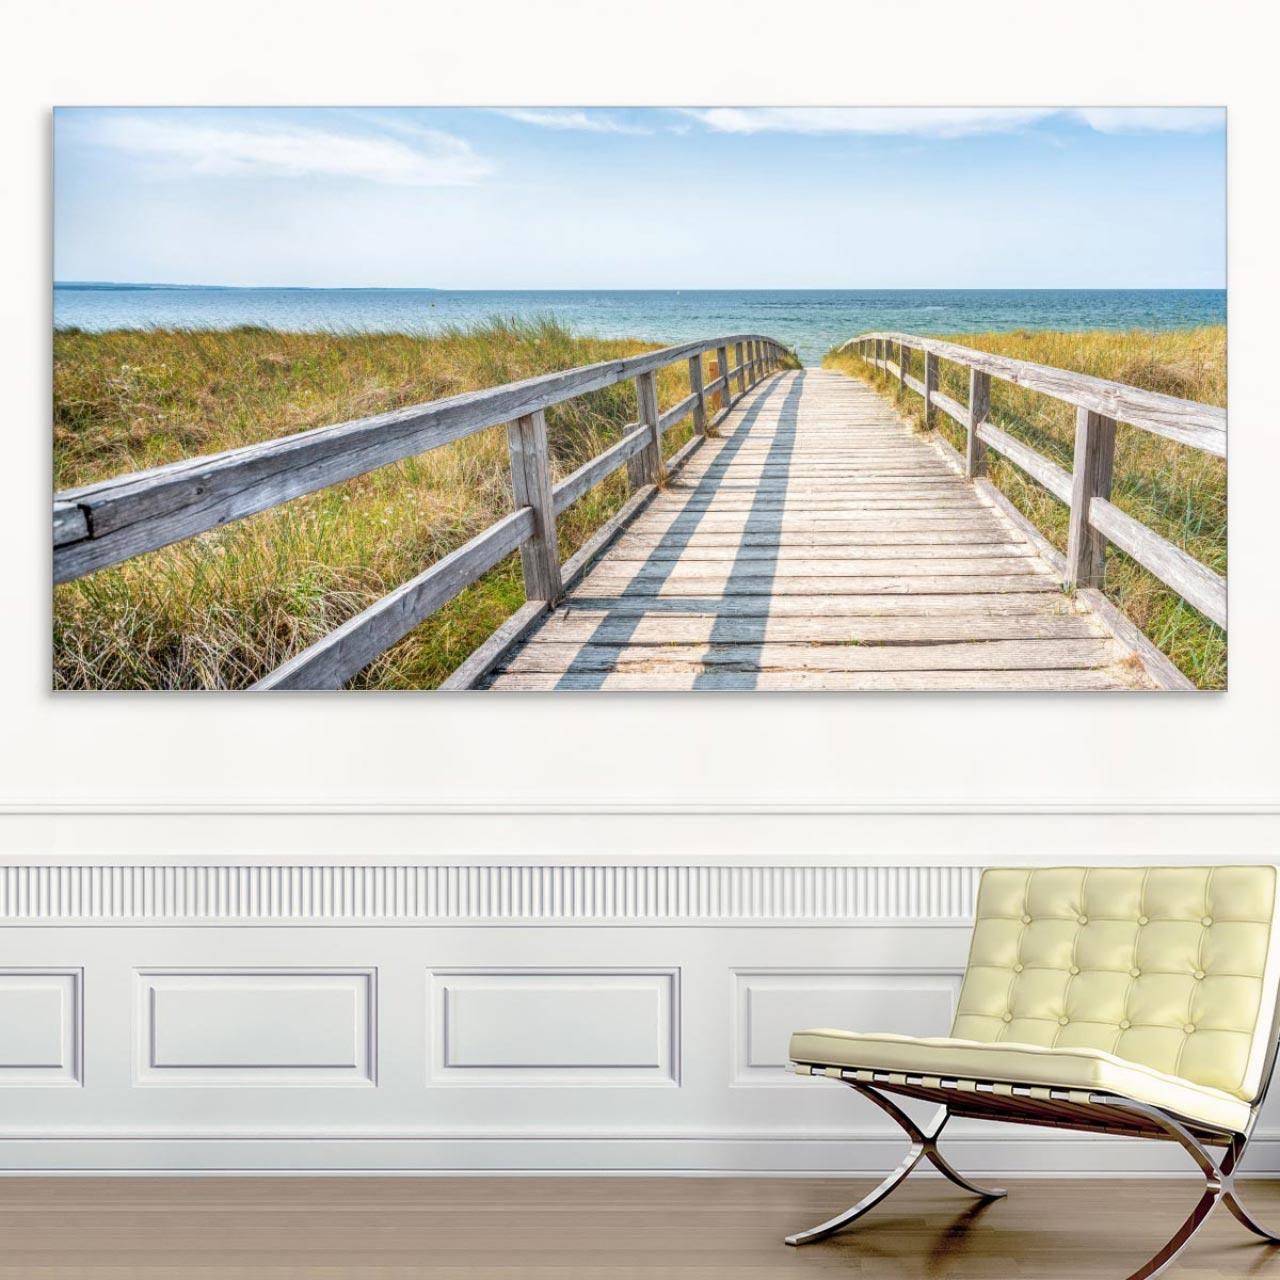 Akustikbild Meer & Strand mit Dünenübergang, einseitig, Wandmontage